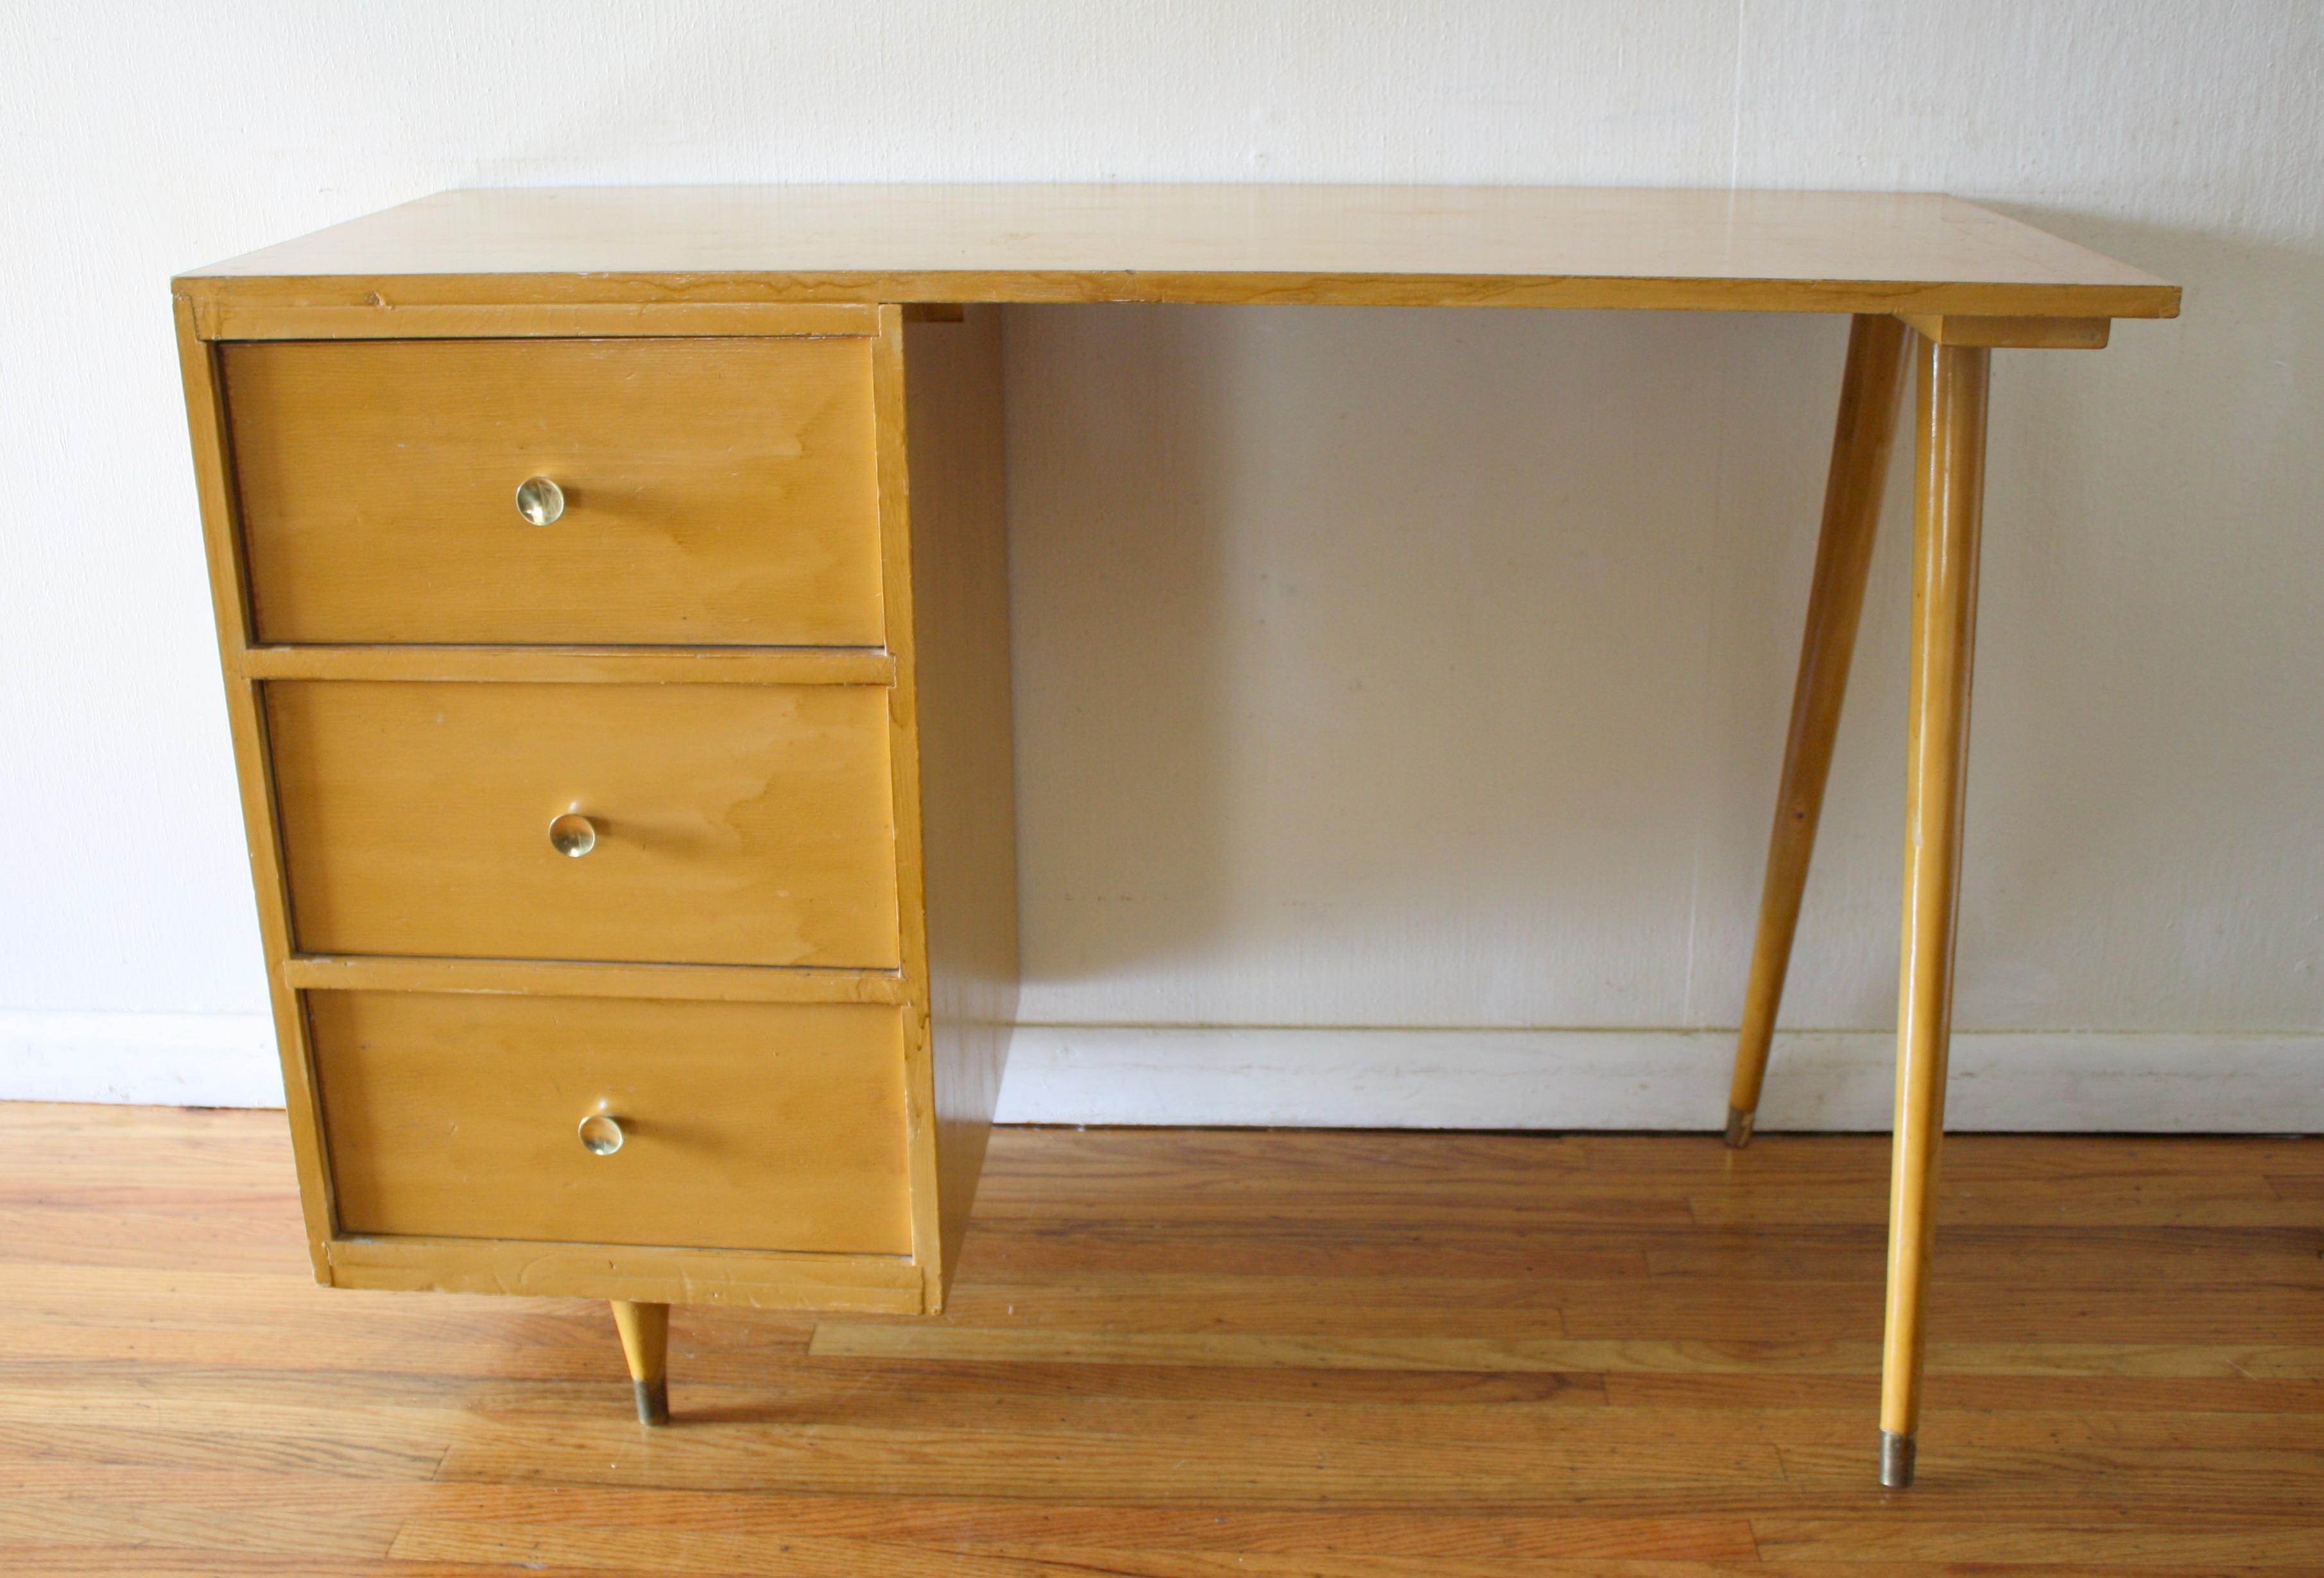 Showy Mcm Blonde Splayed Leg Desk Mid Century Desks Picked Vintage Mid Century Desk Wallpaper Mid Century Desk Chair houzz 01 Mid Century Modern Desk